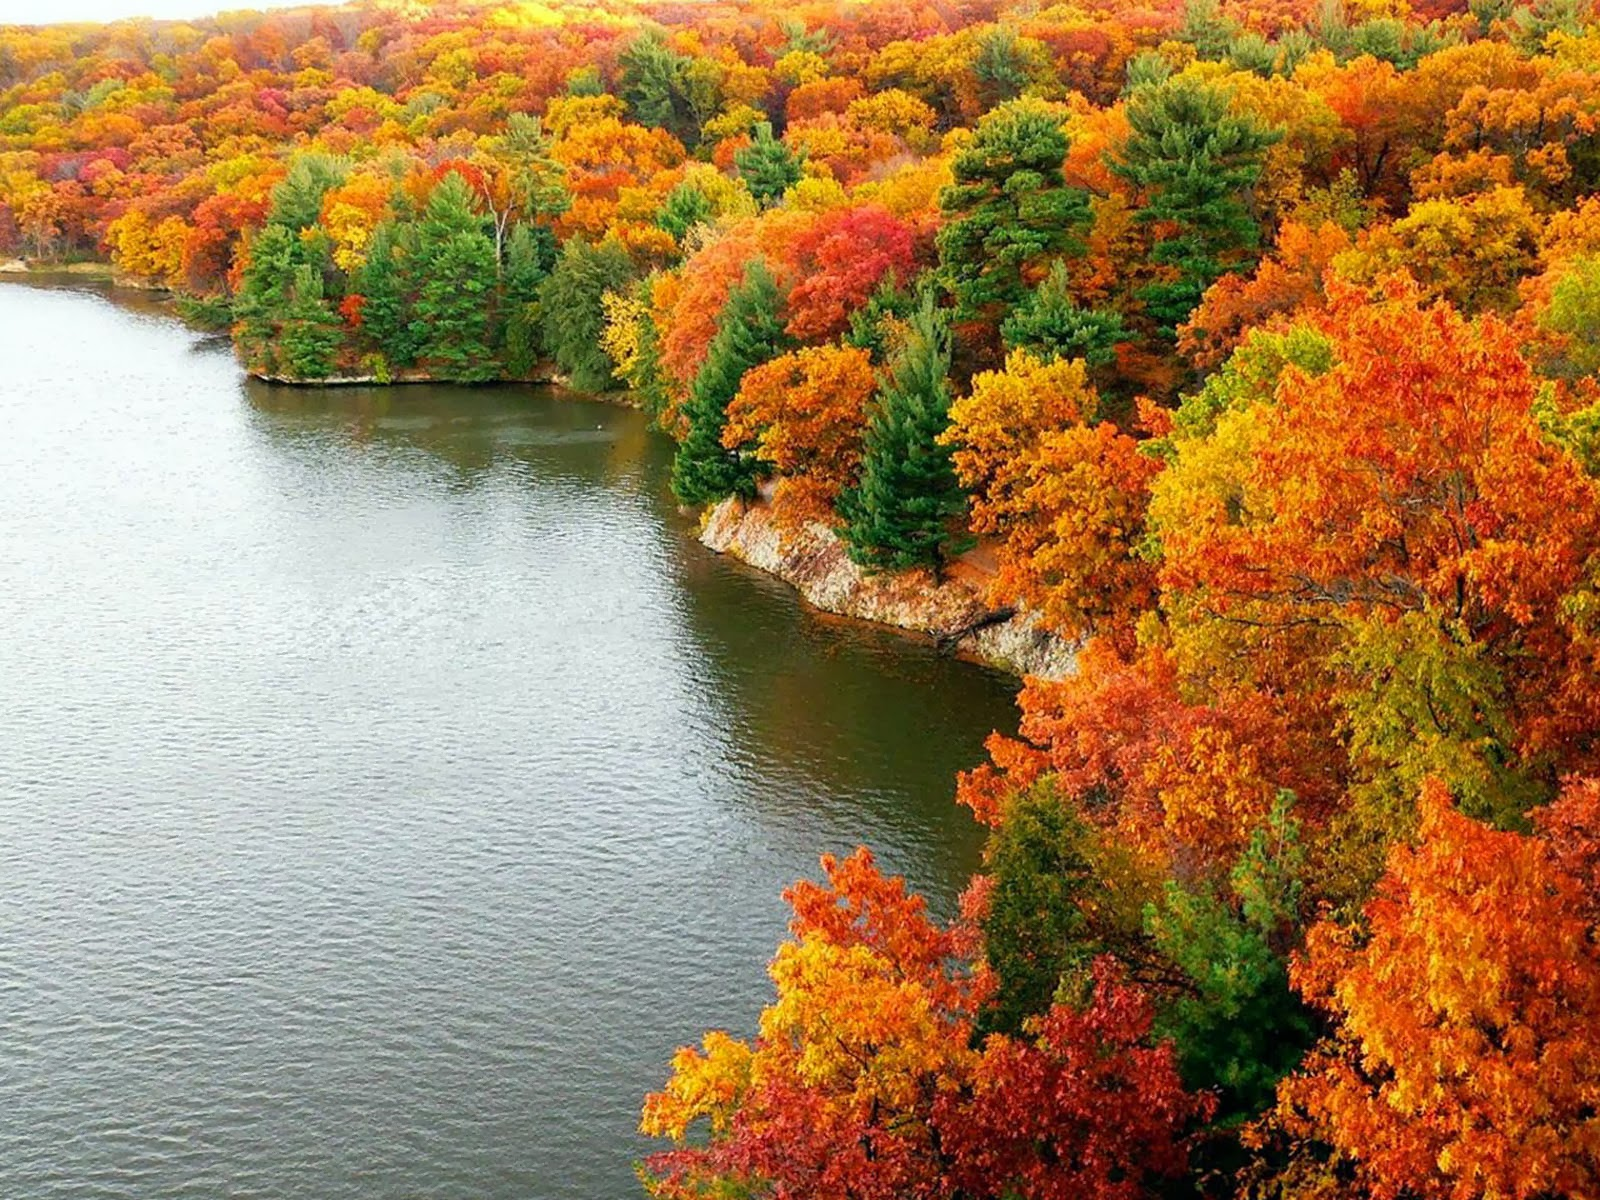 Beautiful Autumn scenery wallpaper Gallery 1600x1200